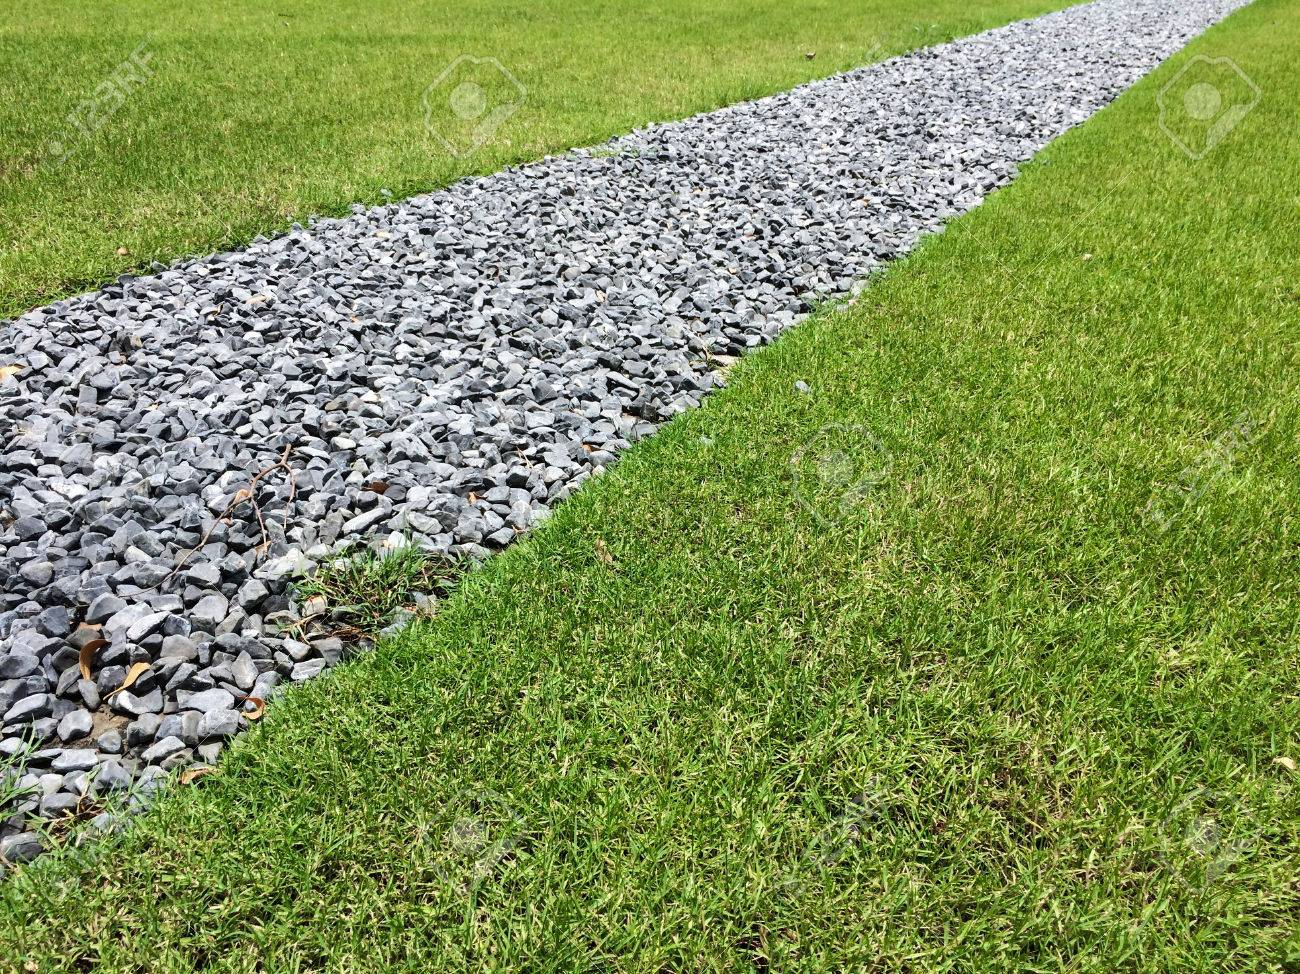 Gray Gravel Walking Path In A Grass Field/lawn Of A Garden Stock Photo